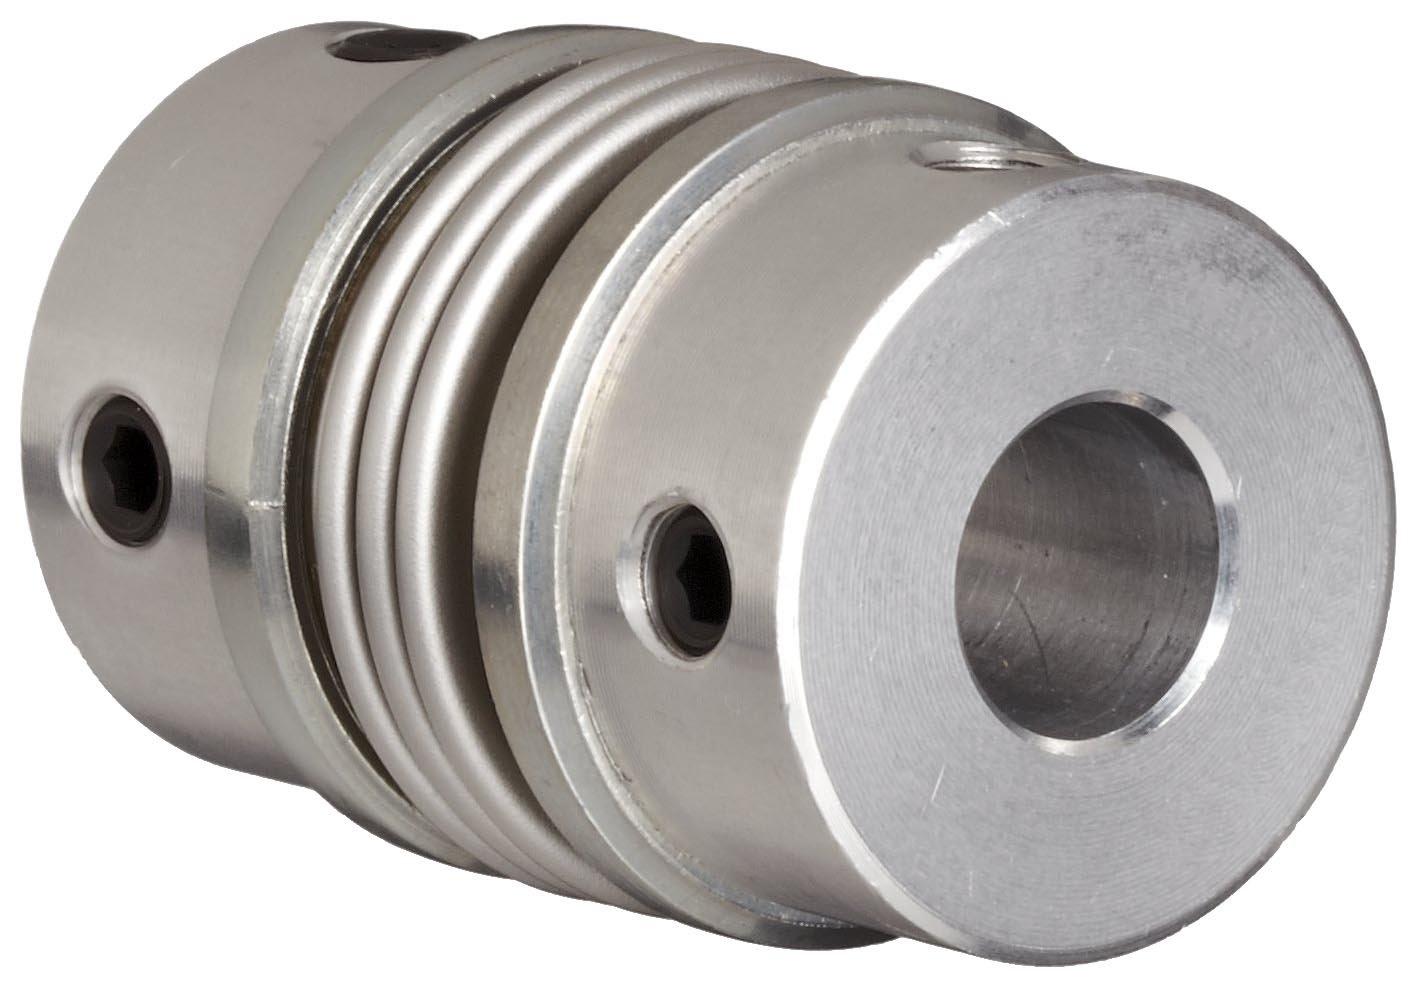 interhawks bellows key part - HD1417×987